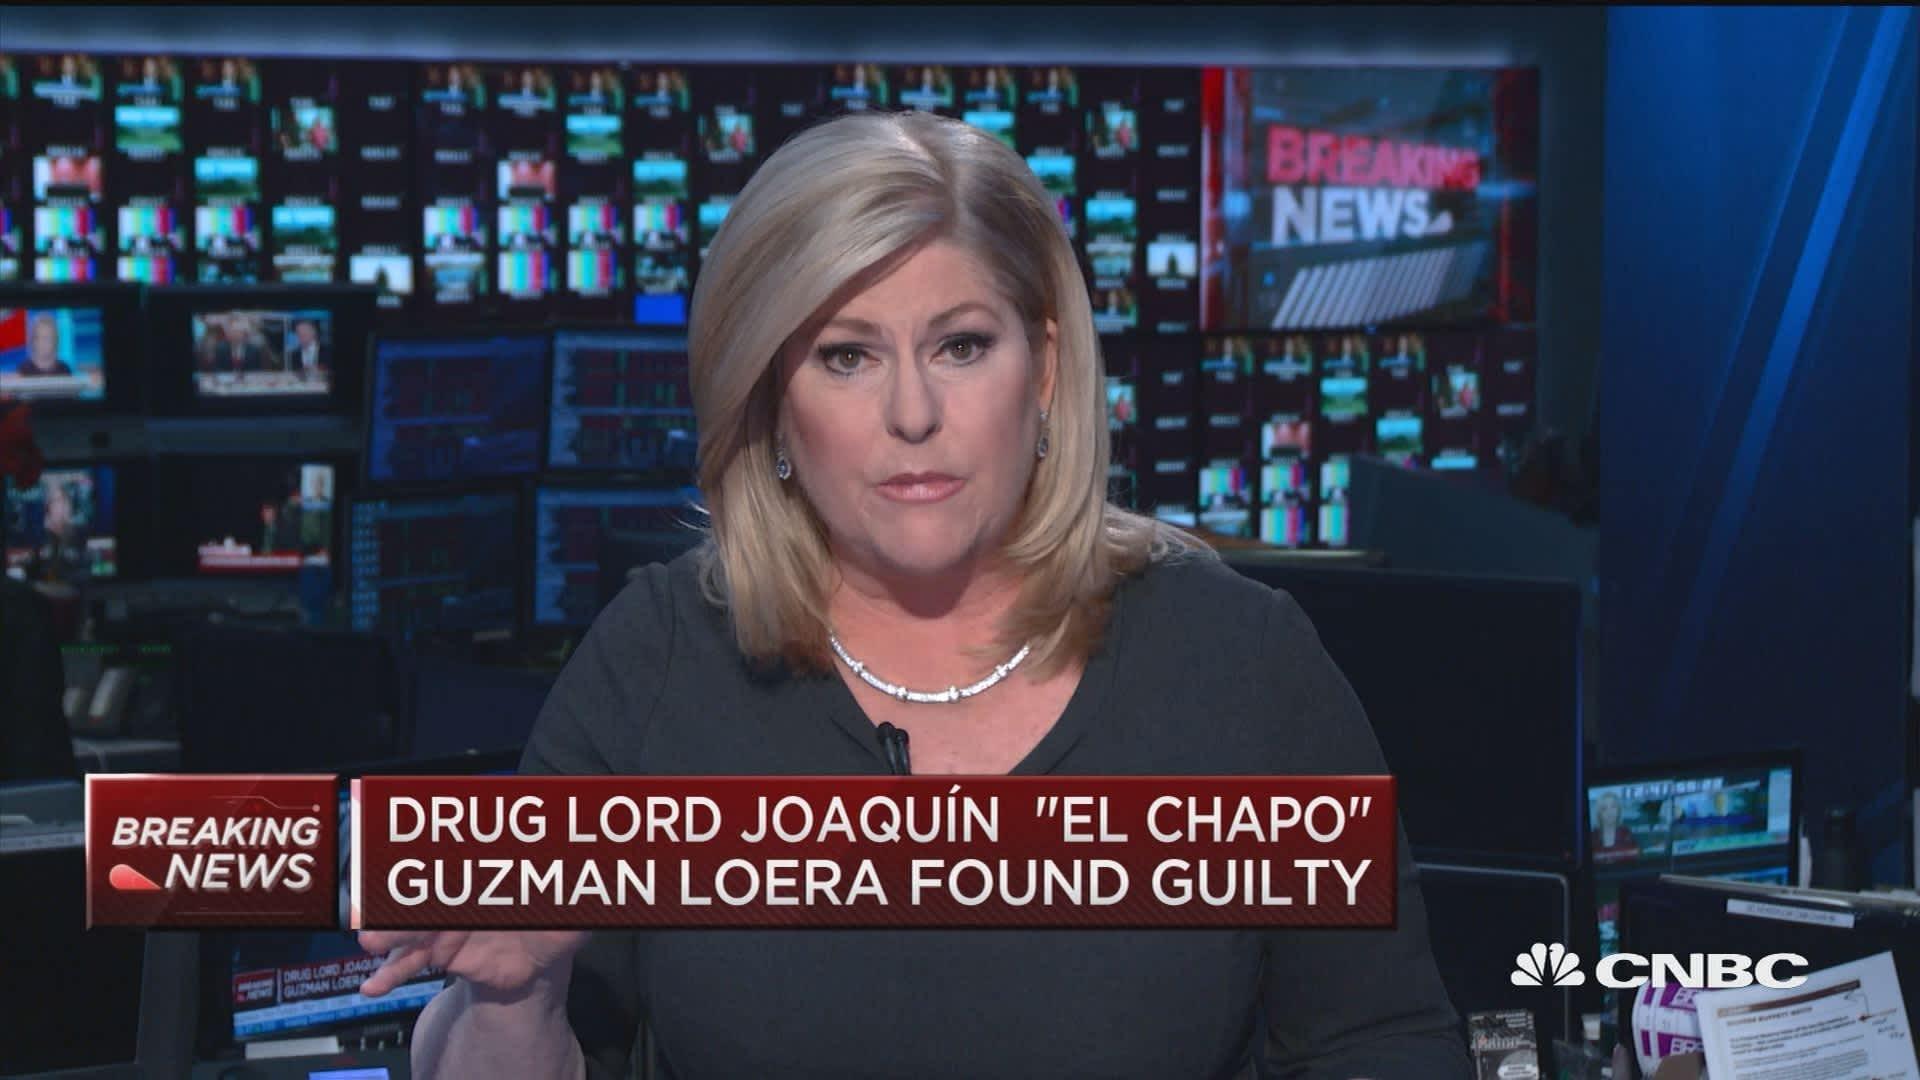 Drug kingpin El Chapo sentenced to life in prison, must forfeit $12.6 billion